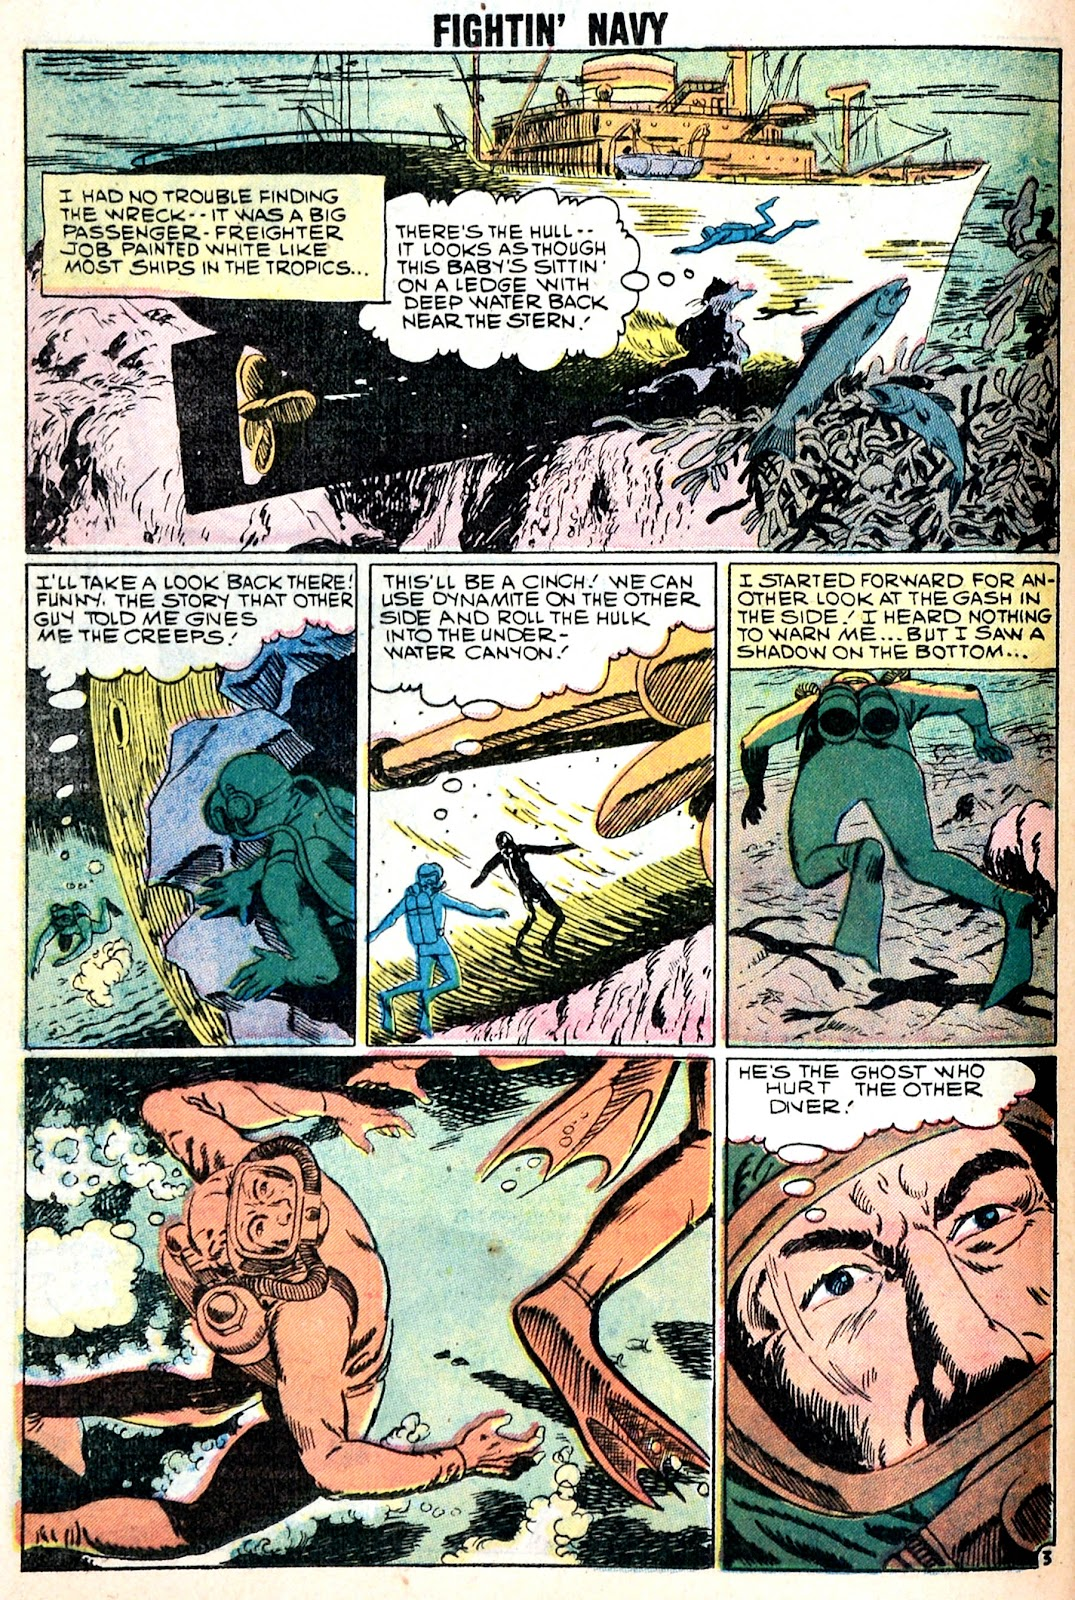 Read online Fightin' Navy comic -  Issue #85 - 24